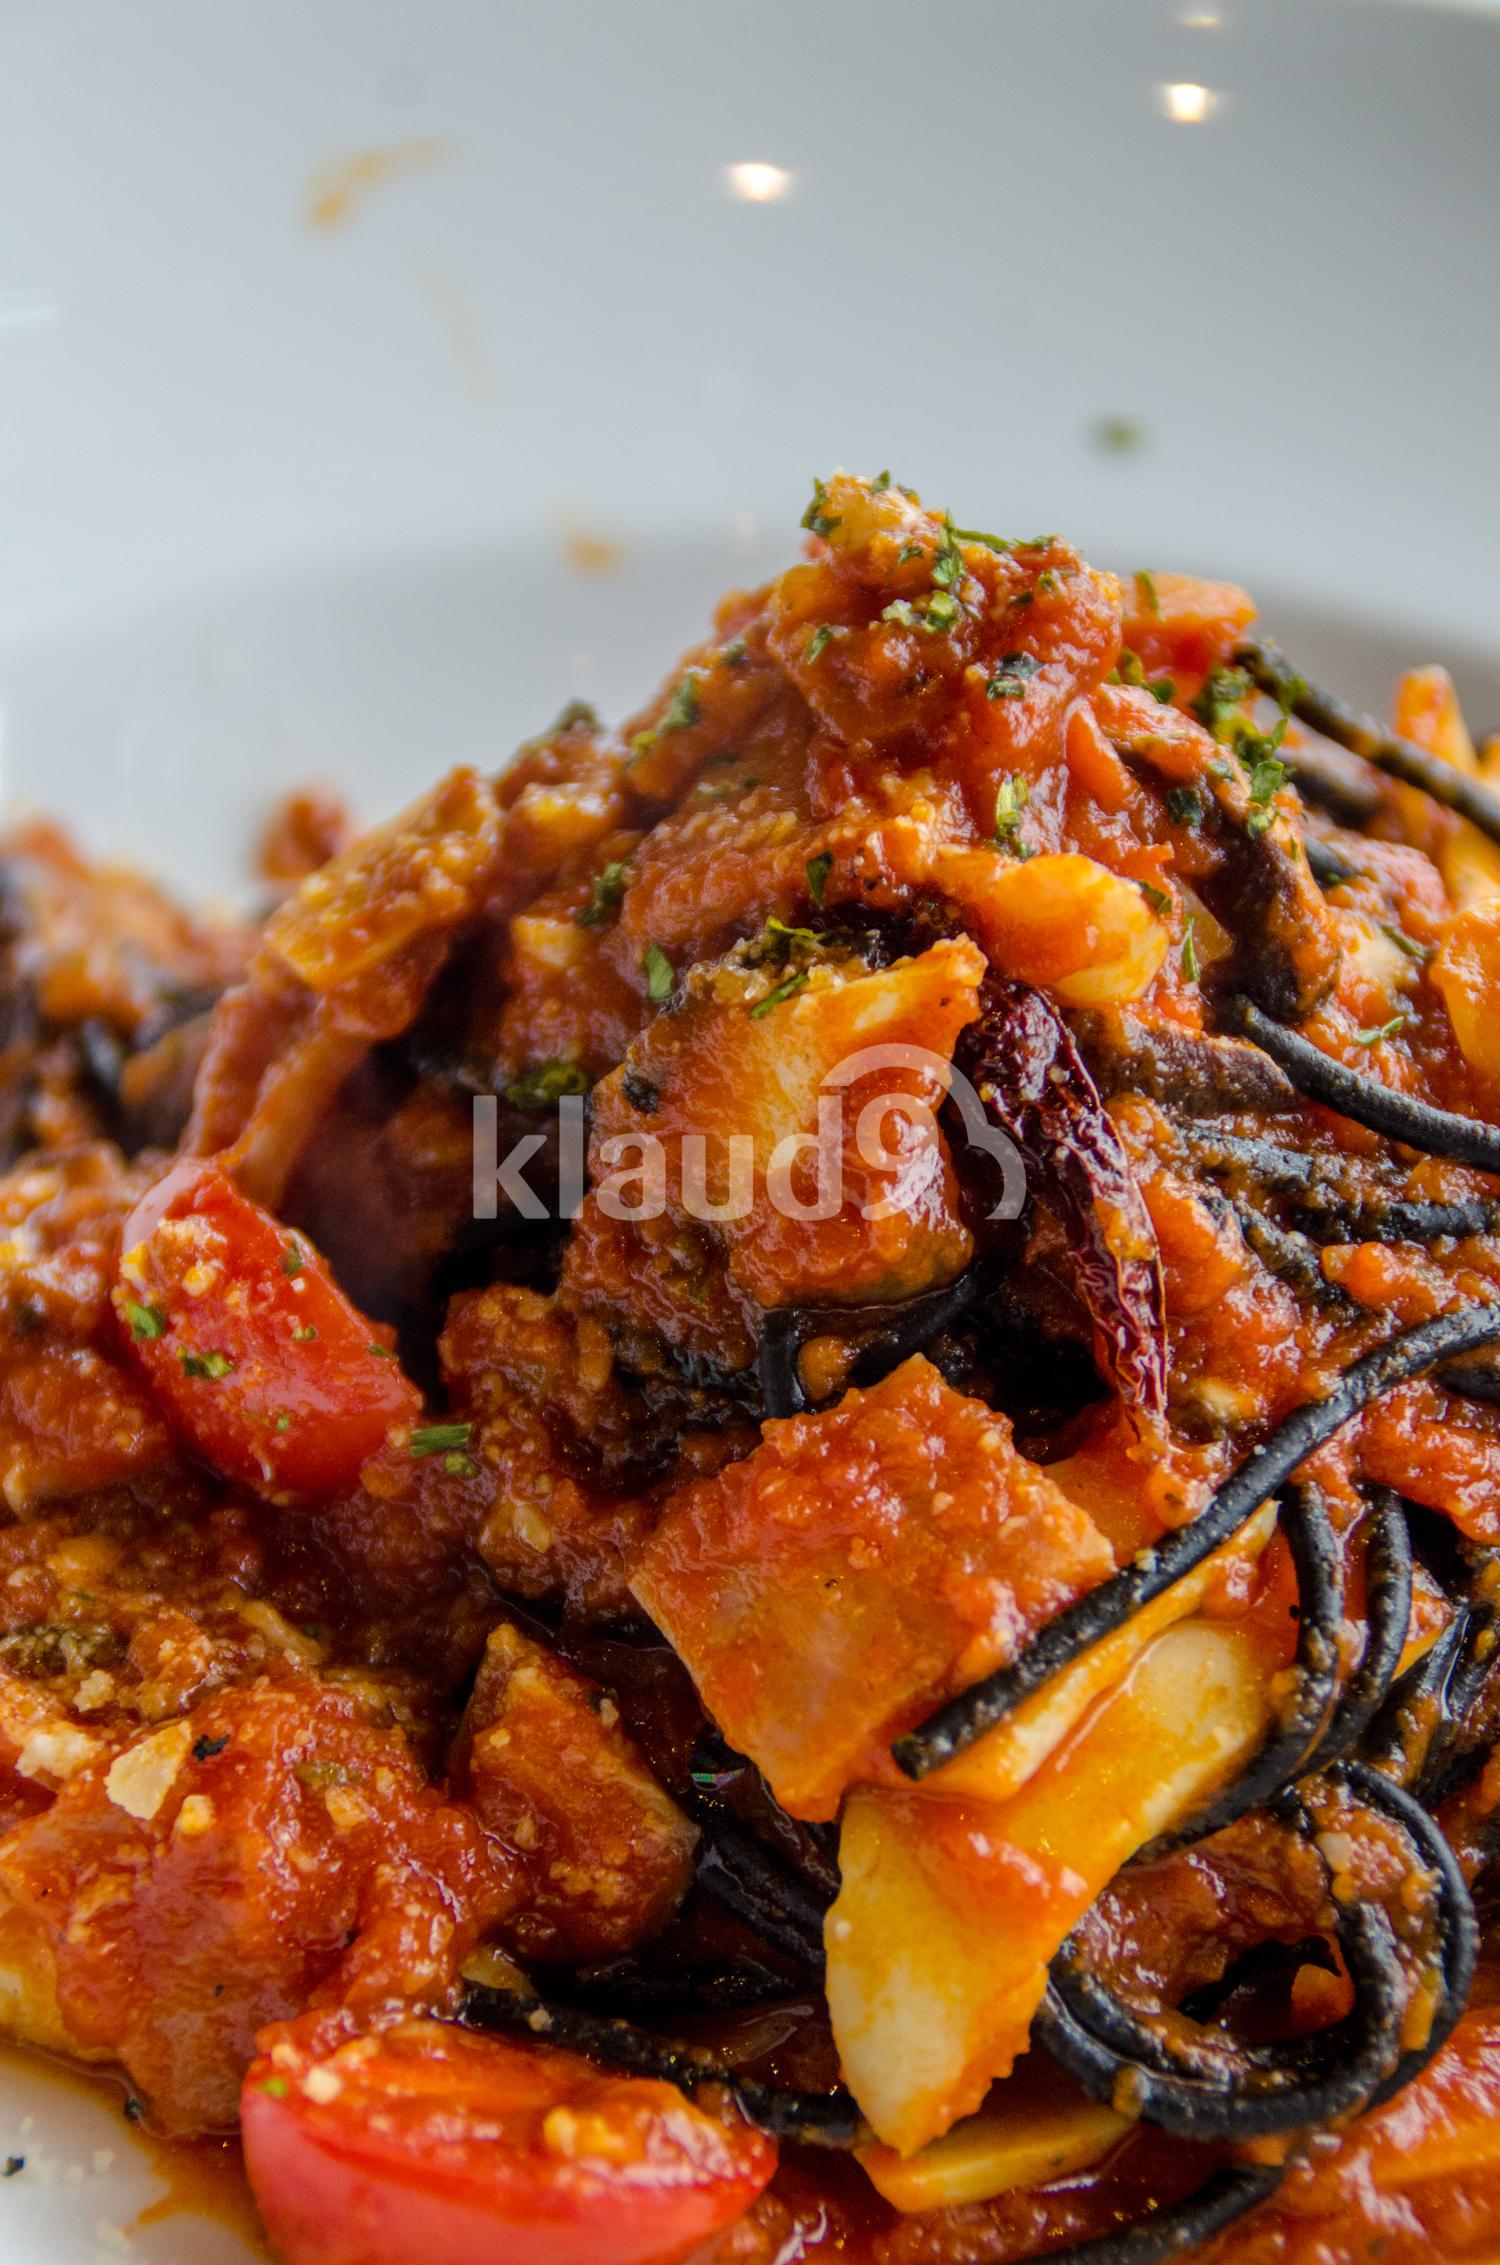 Black spaghetti sauce, chili, seafood